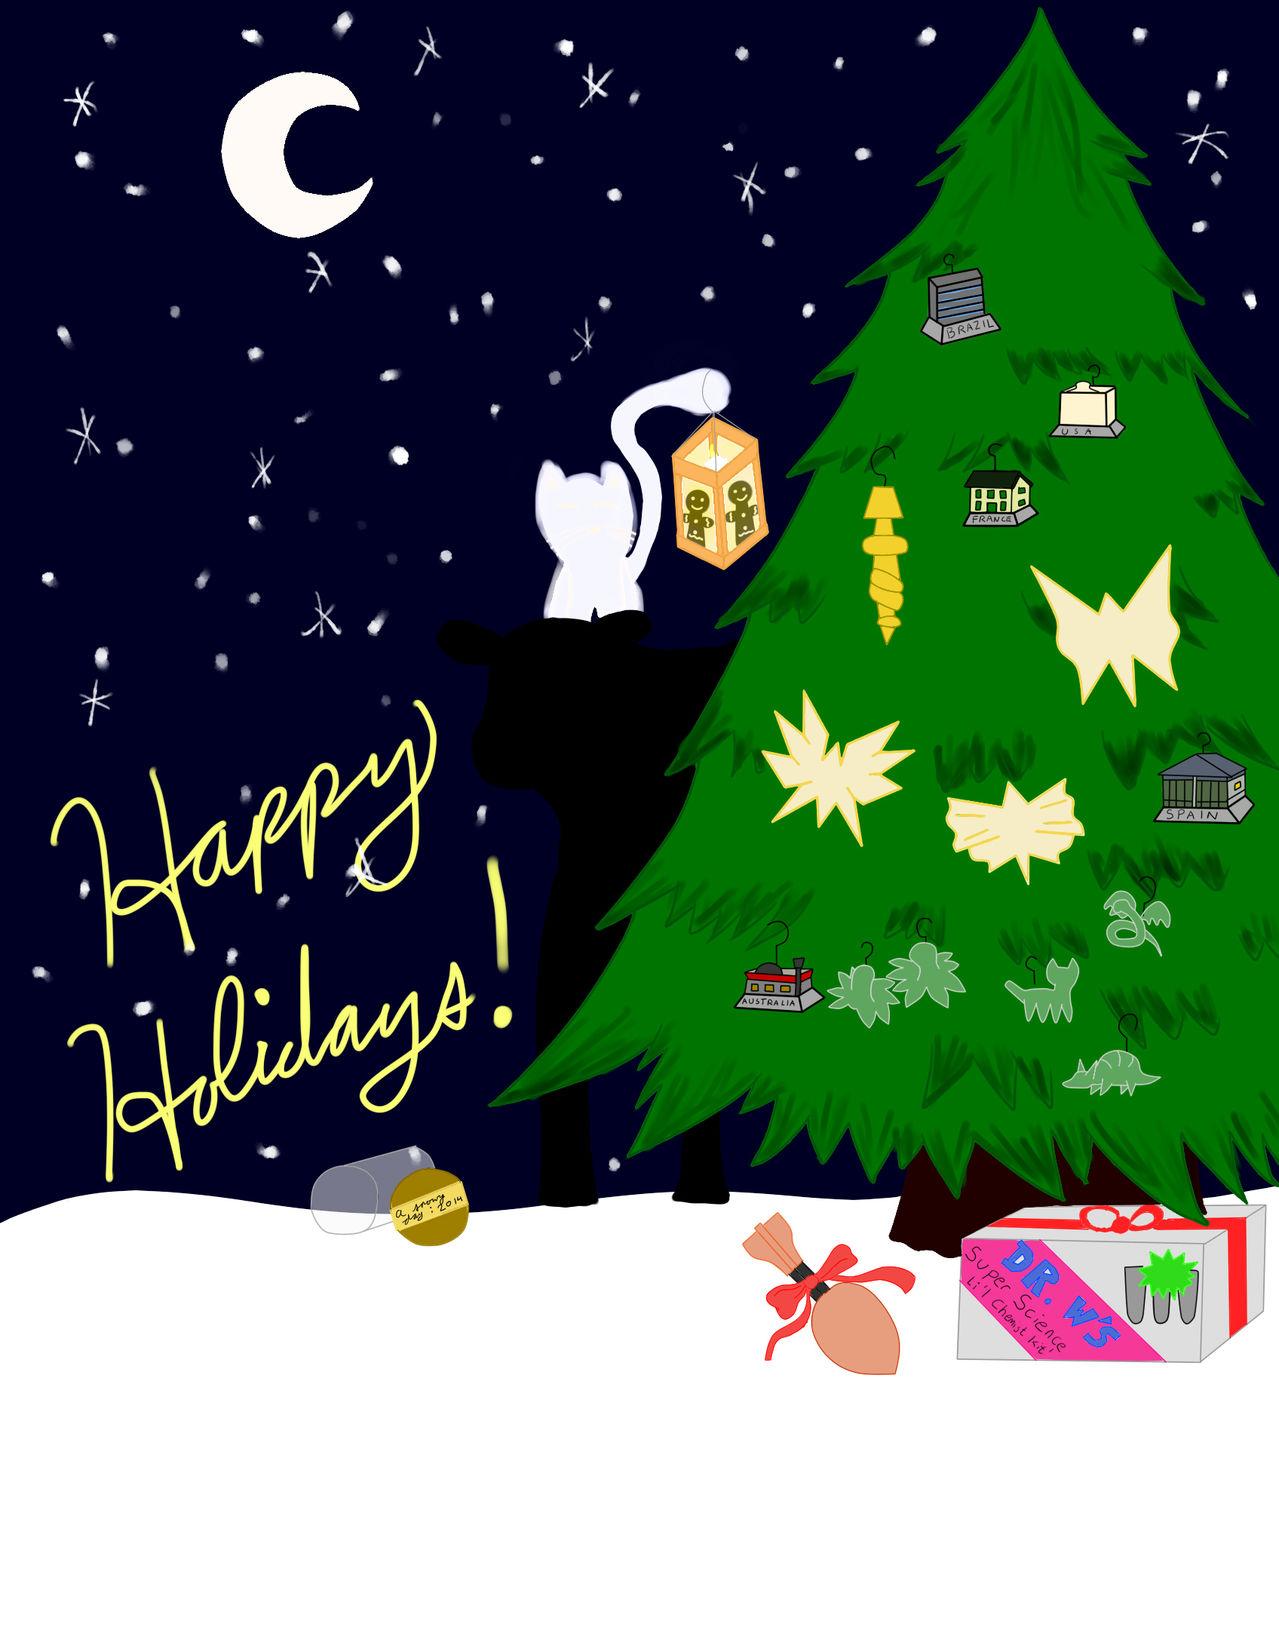 Drewbear_Holidays.jpg